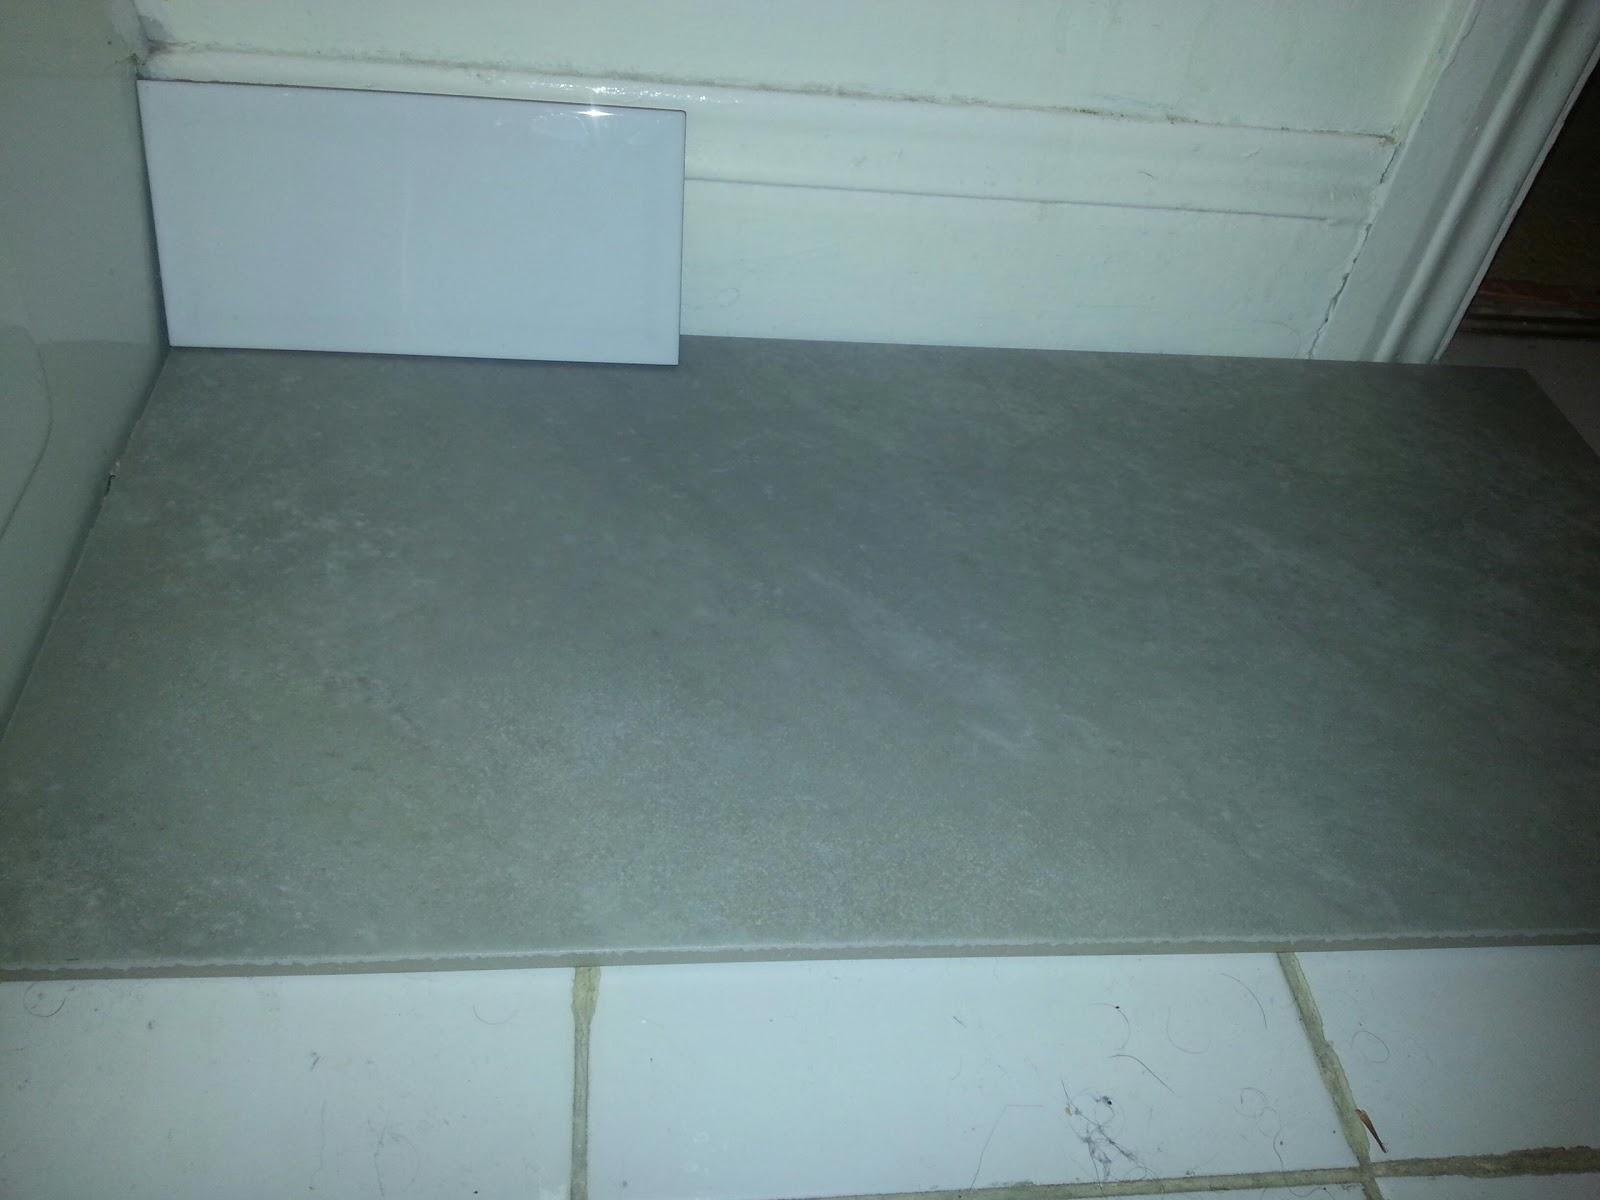 Dublinia: Bathroom - change of tile